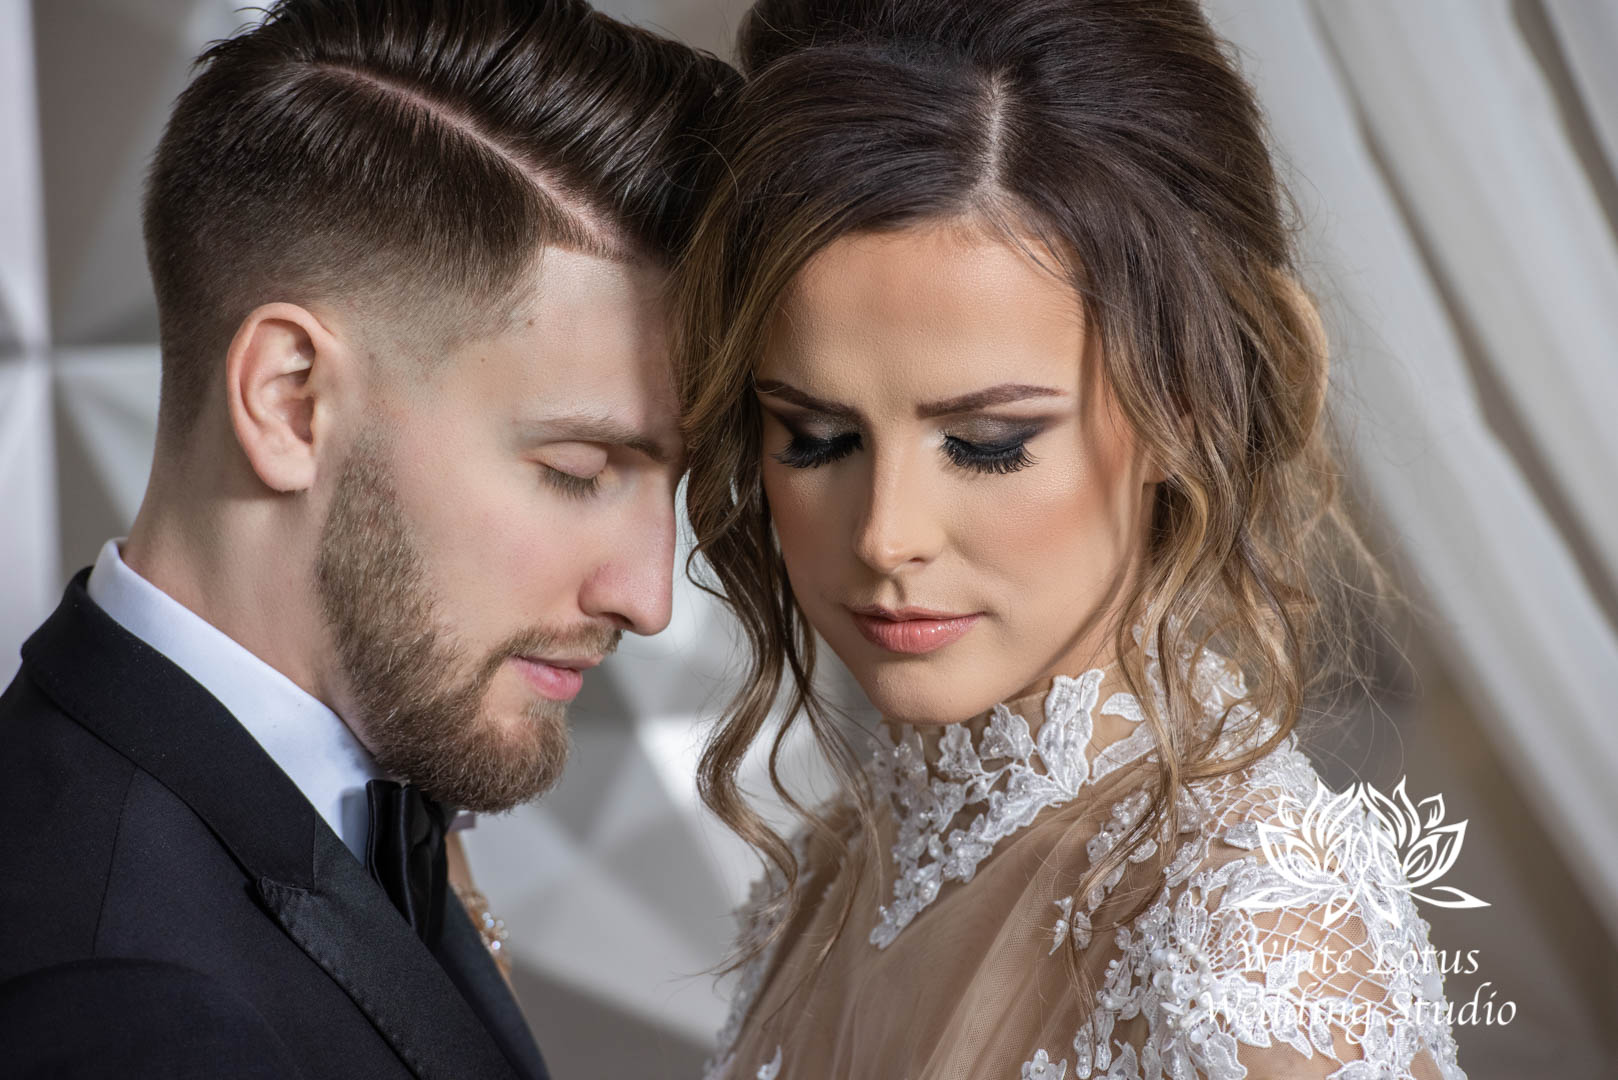 020- GLAM WINTERLUXE WEDDING INSPIRATION